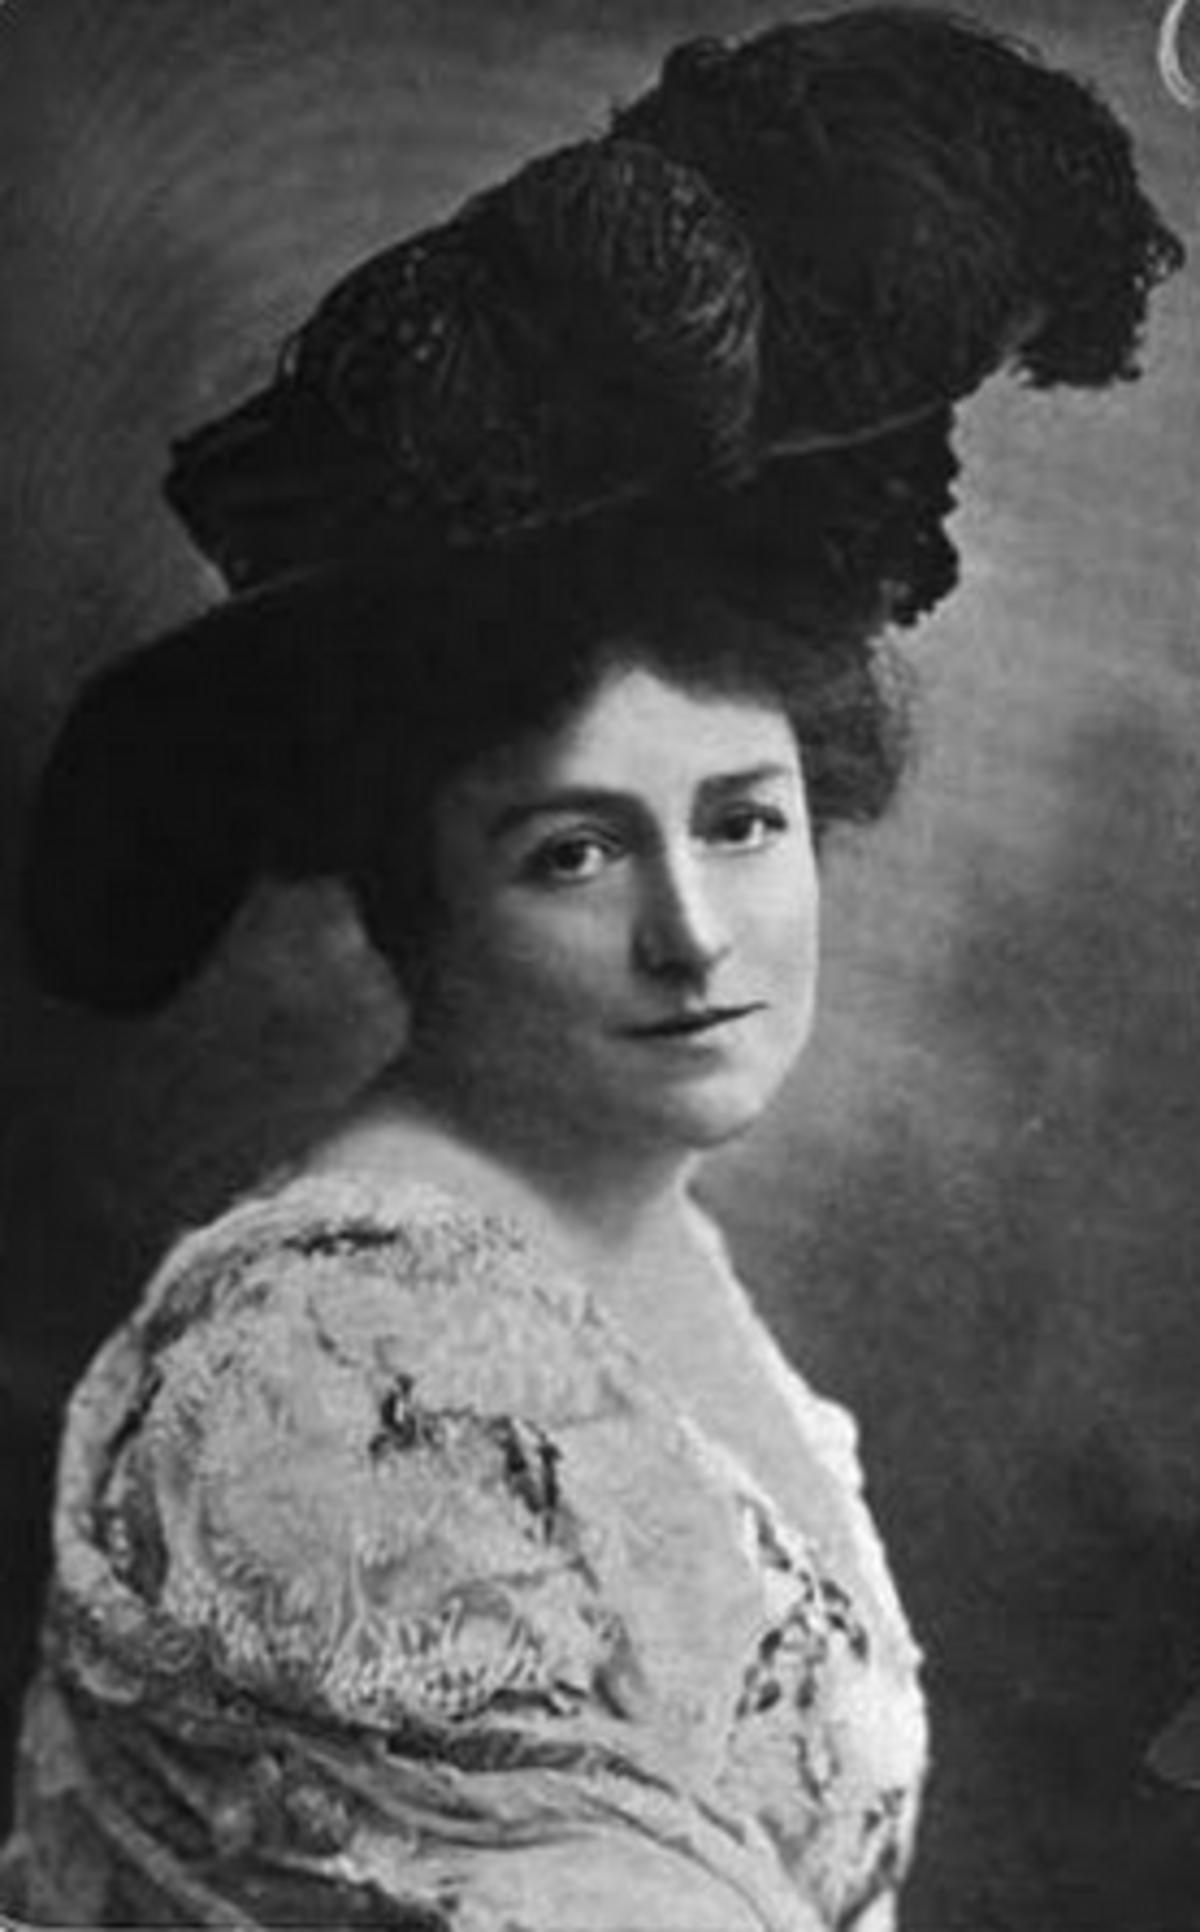 Ethel Irving